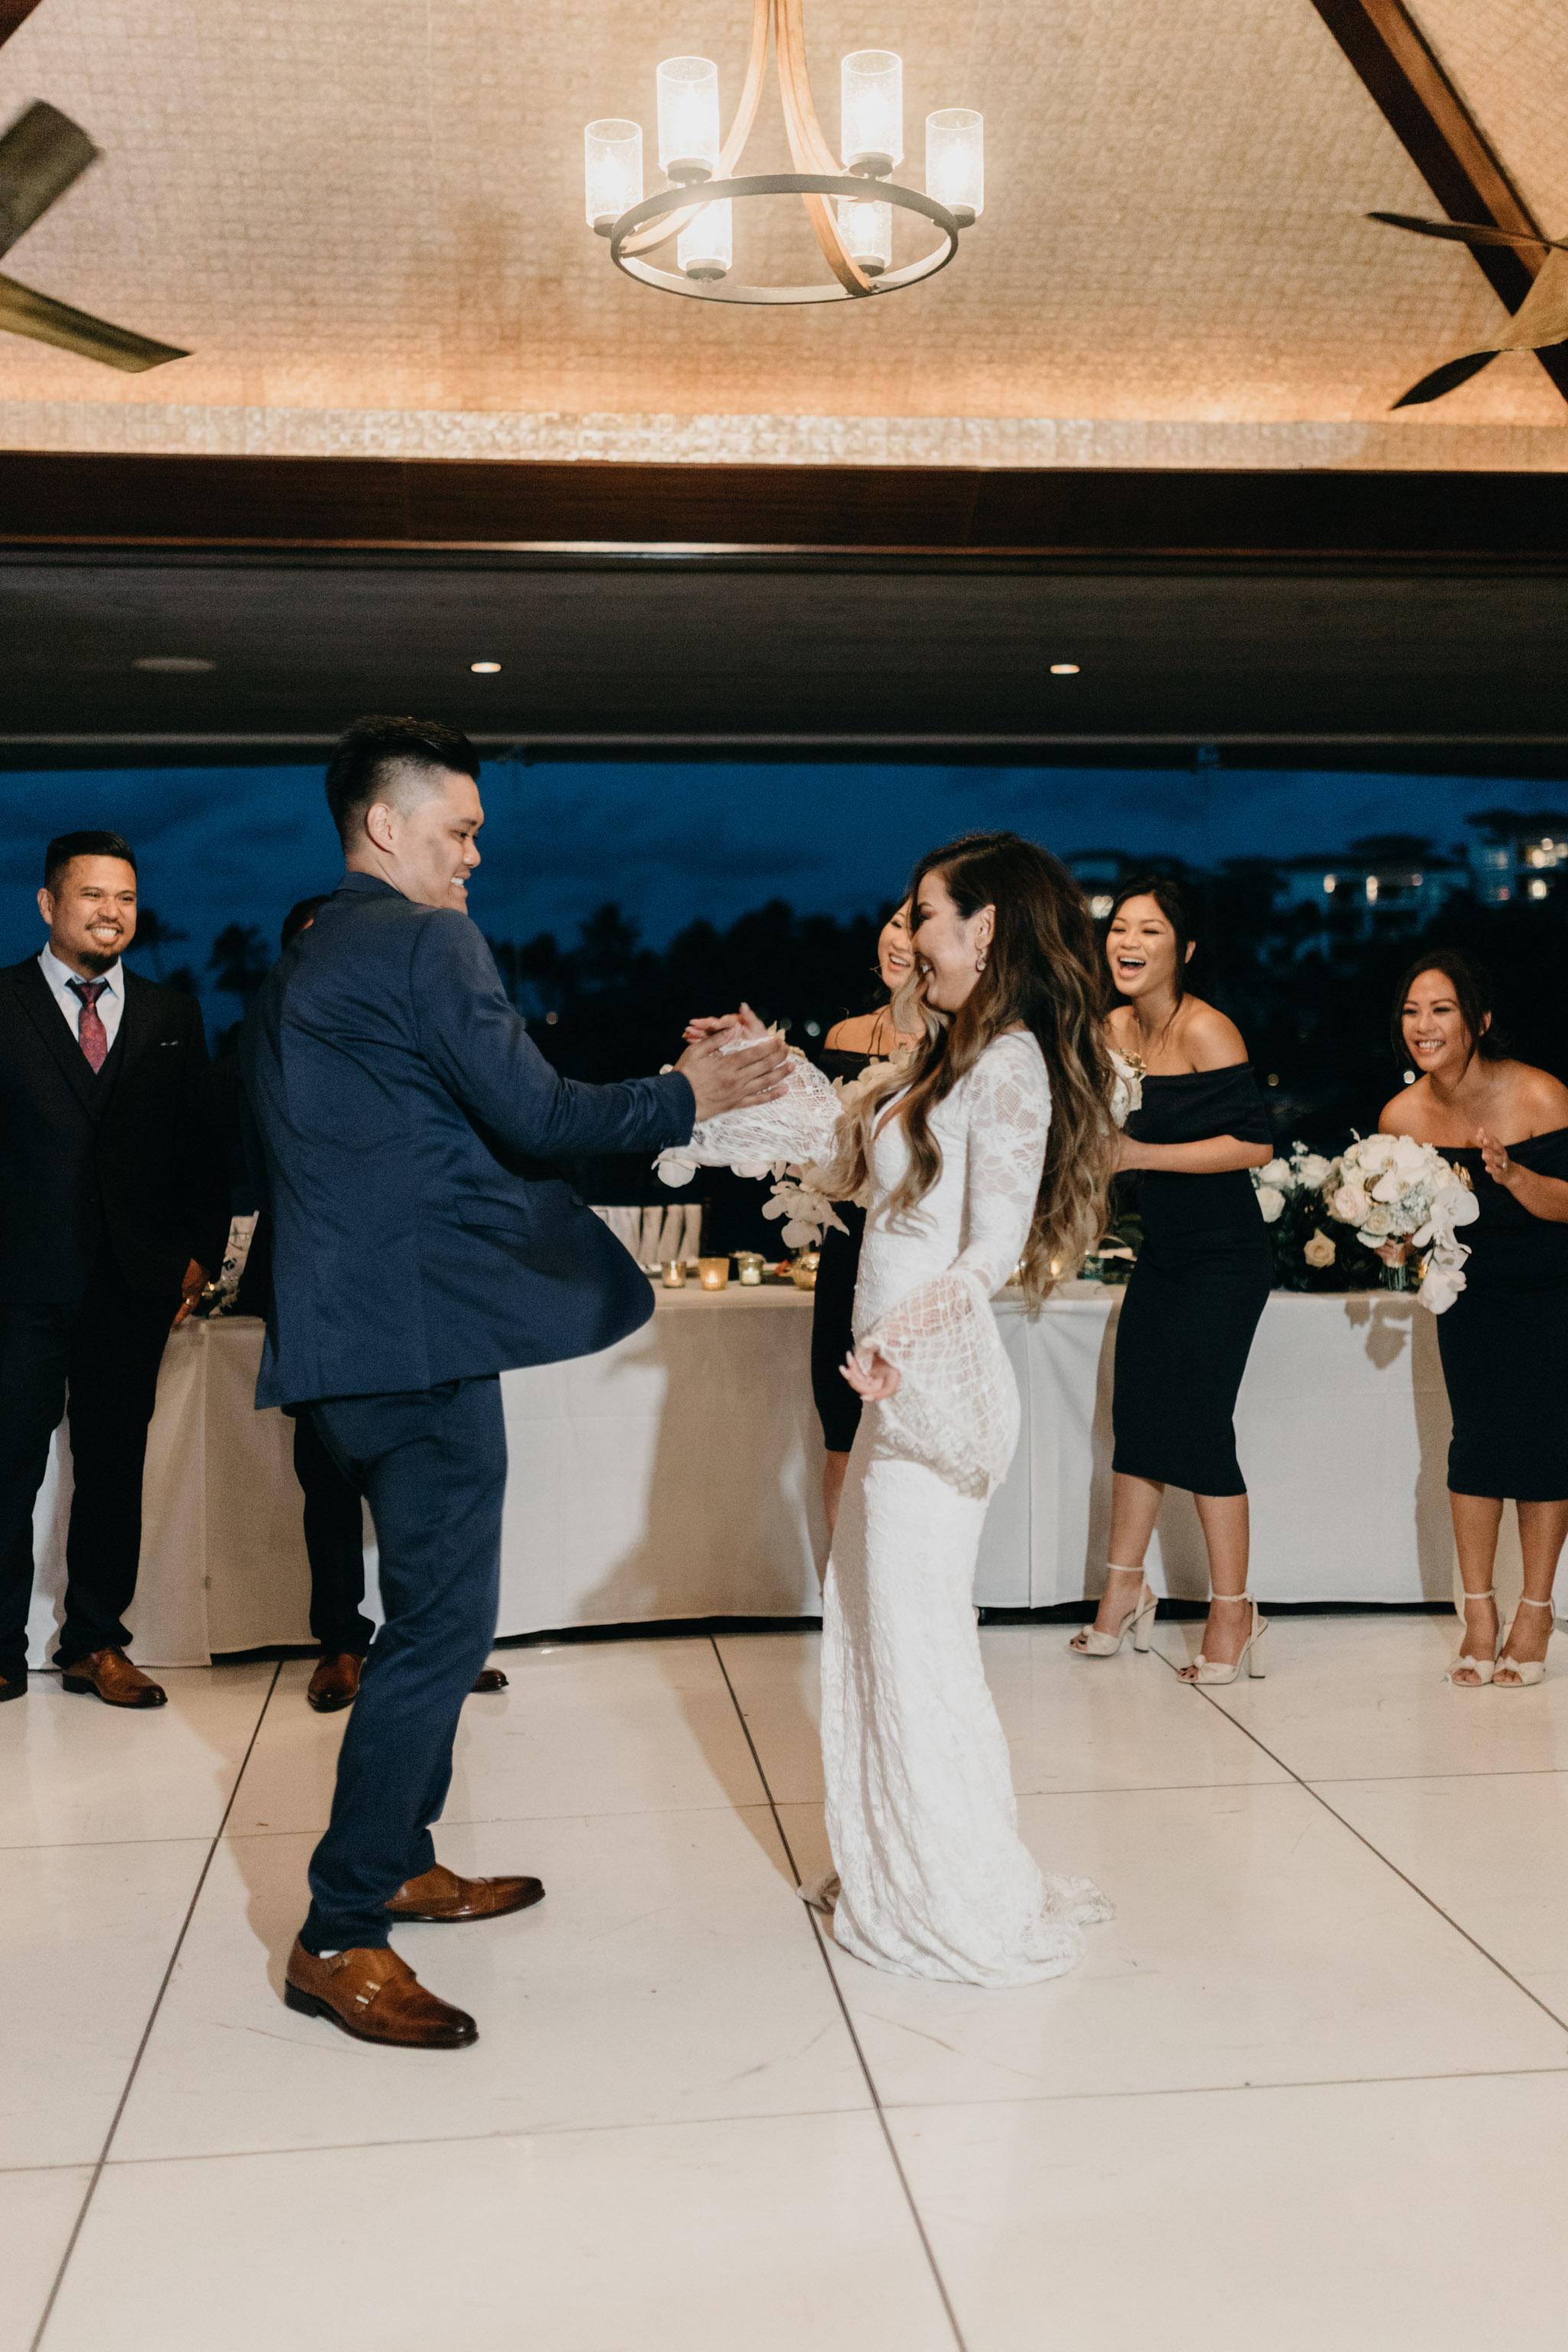 Bride and groom grand entrance idea   Merriman's Kapalua Maui wedding by Hawaii wedding photographer Desiree Leilani